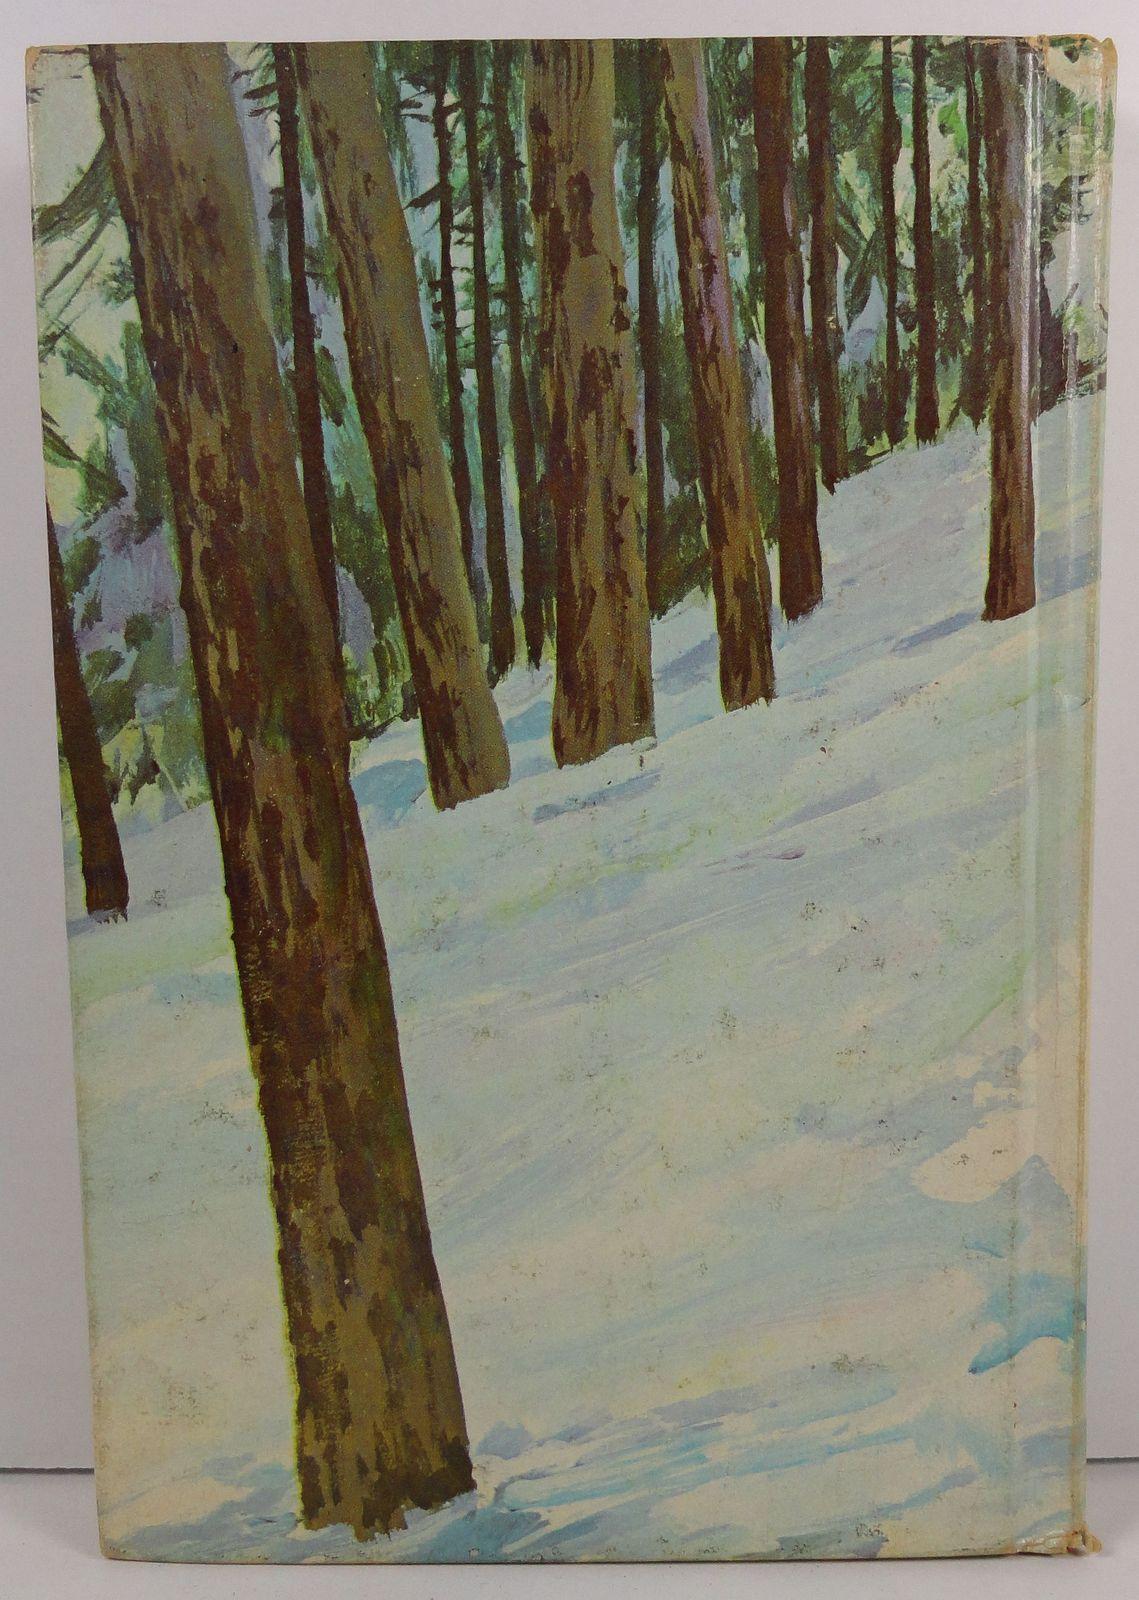 Lassie Lost in the Snow by Steve Frazee 1969 Whitman